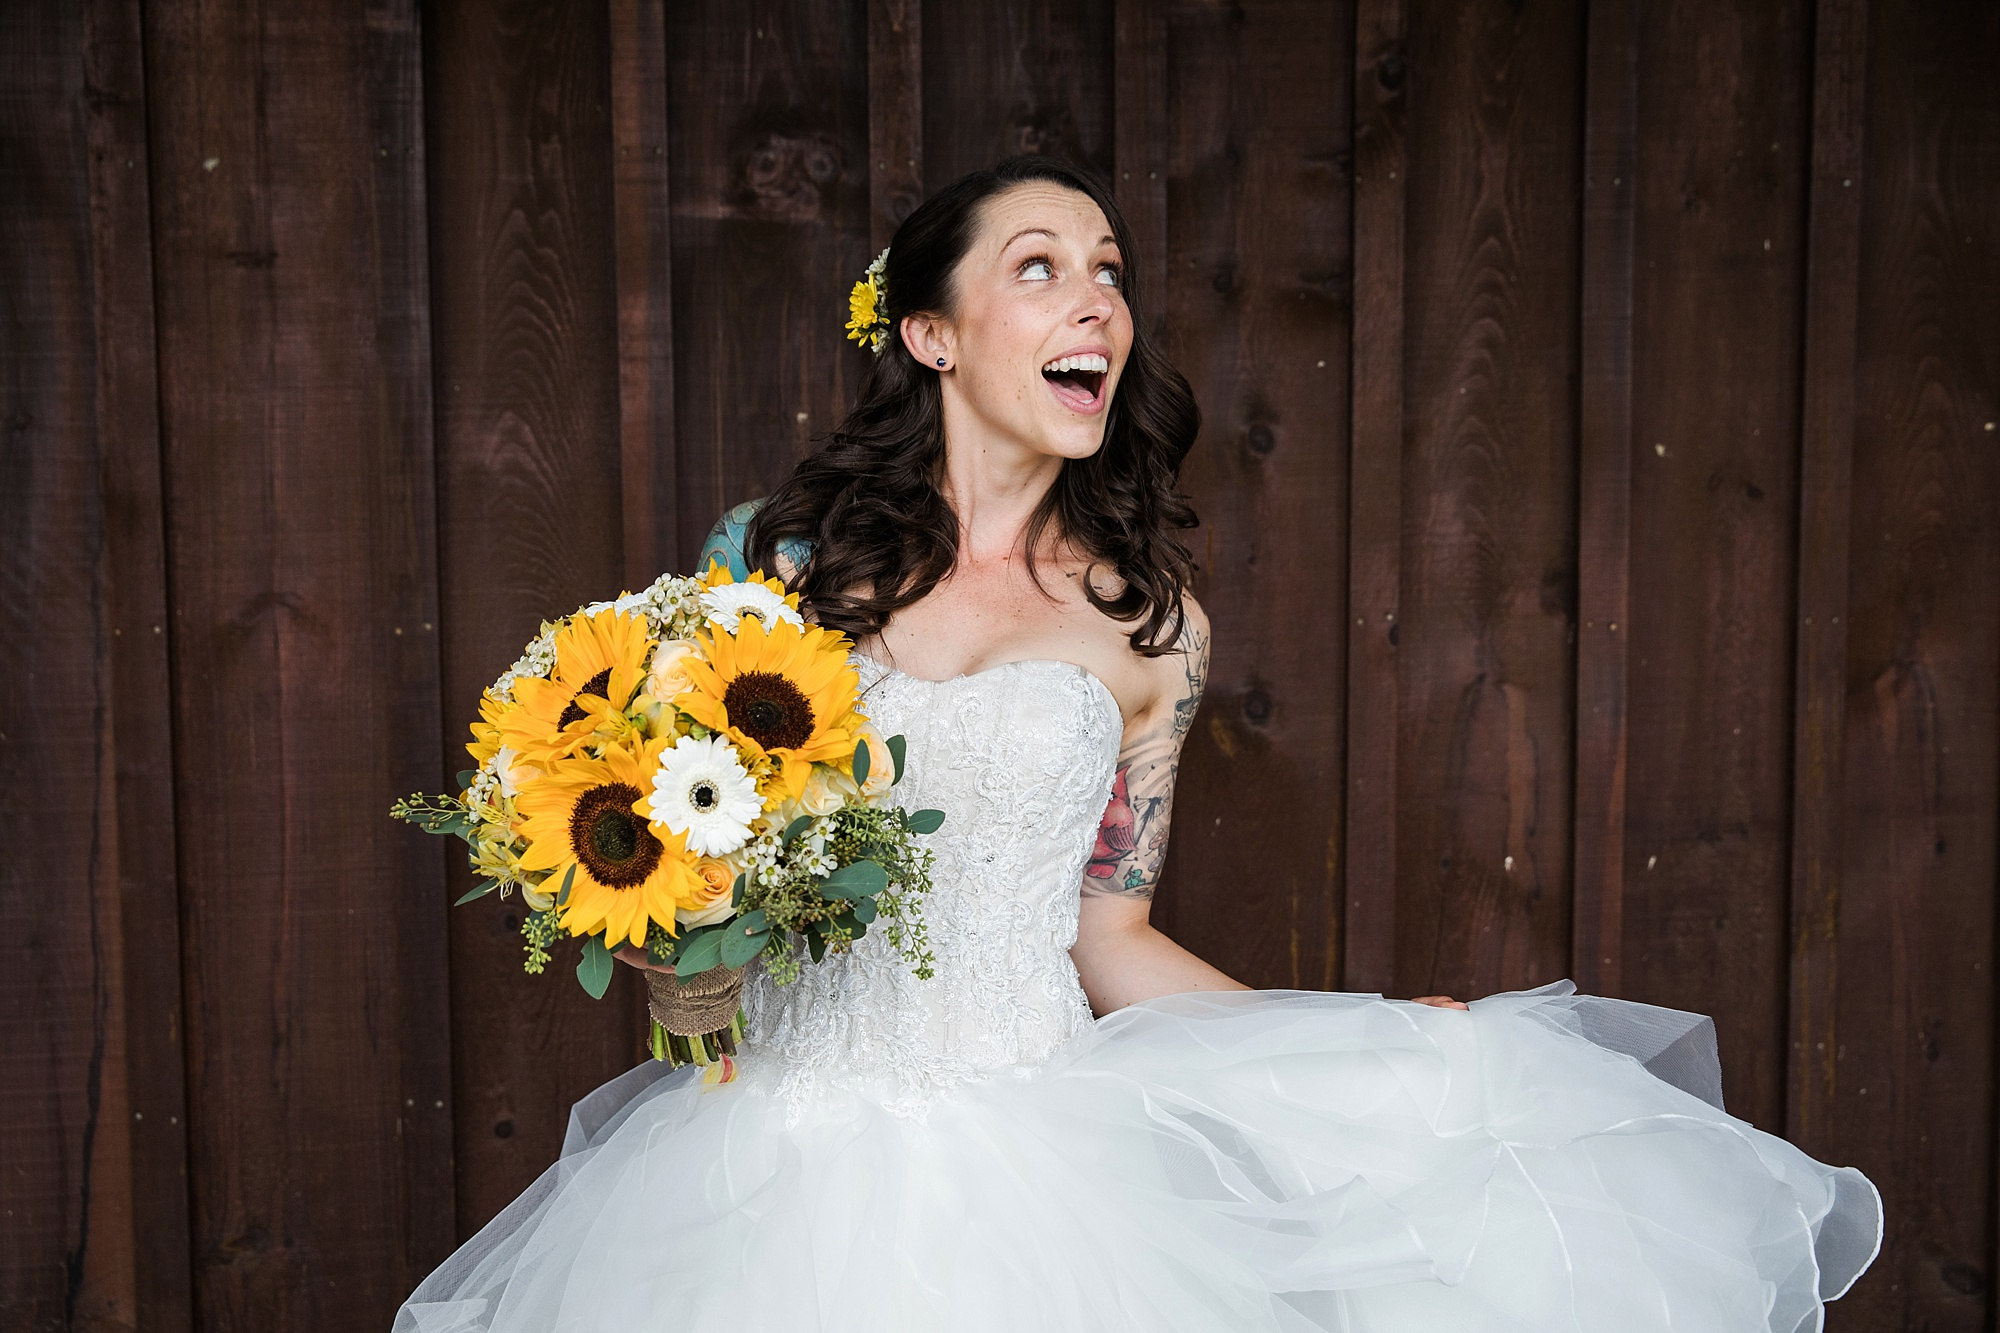 lipapark-hernderwinery-wedding_0027.jpg